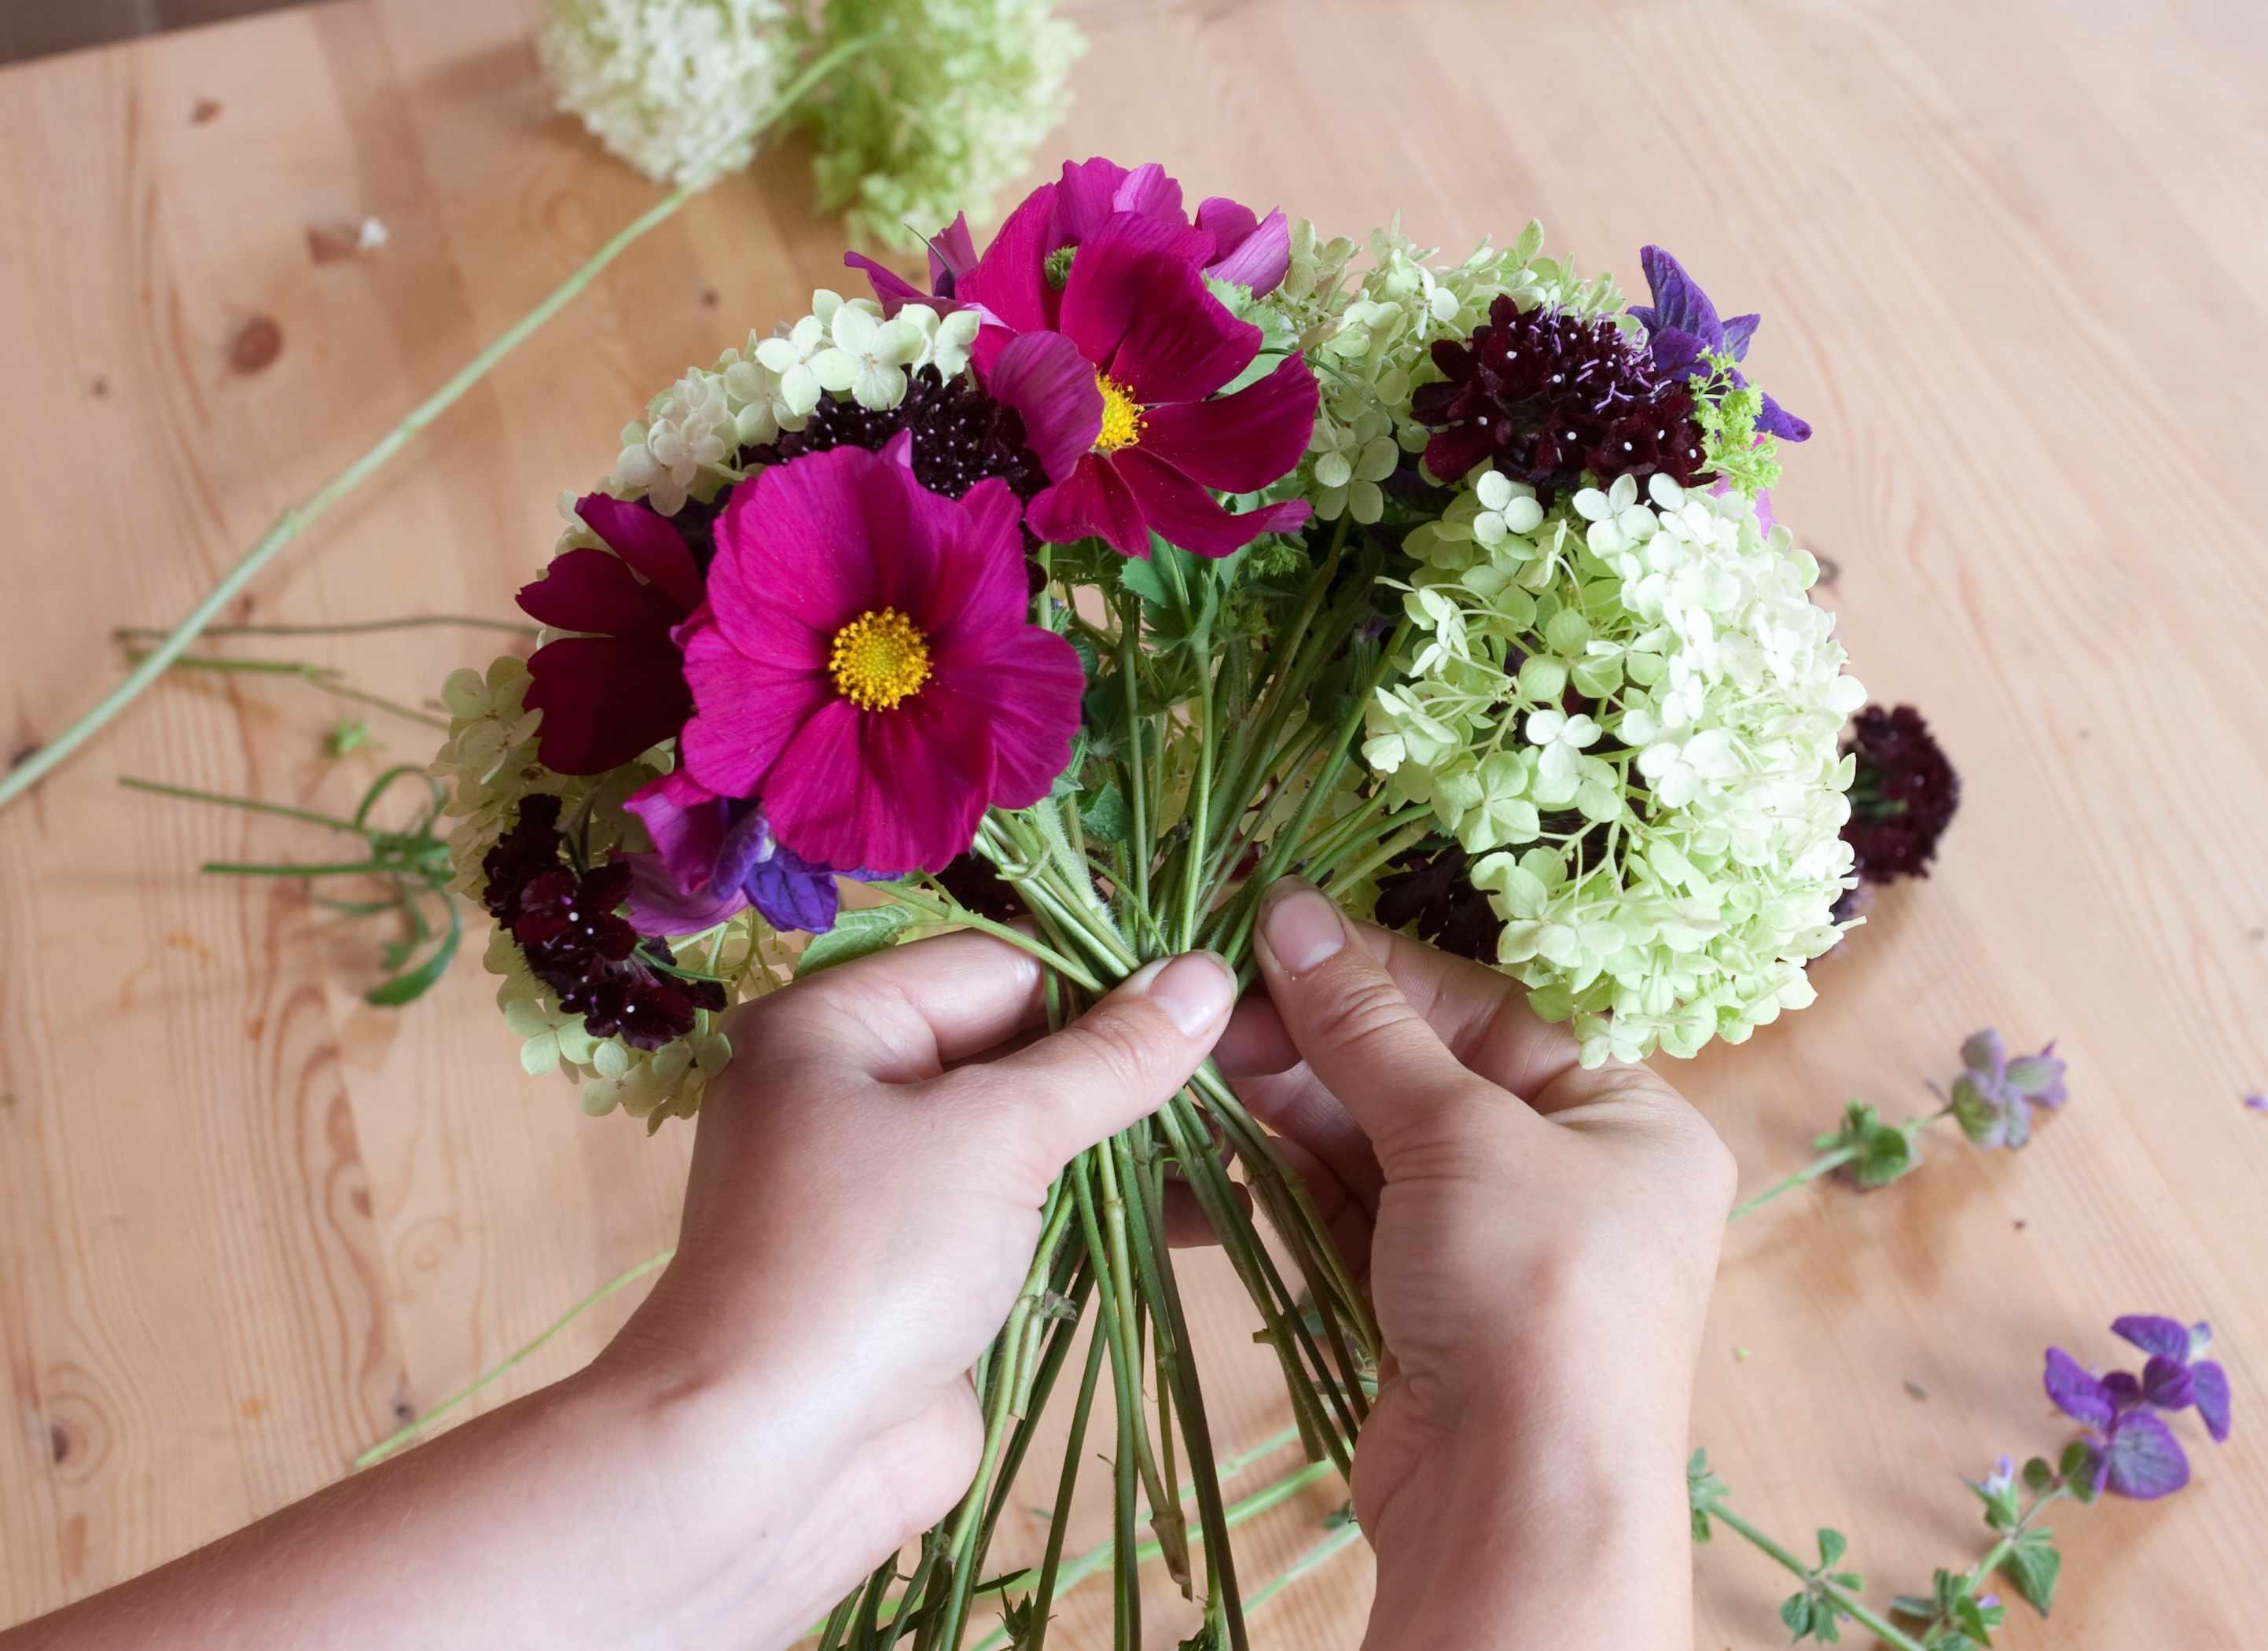 Creating a cut flowers bouquet